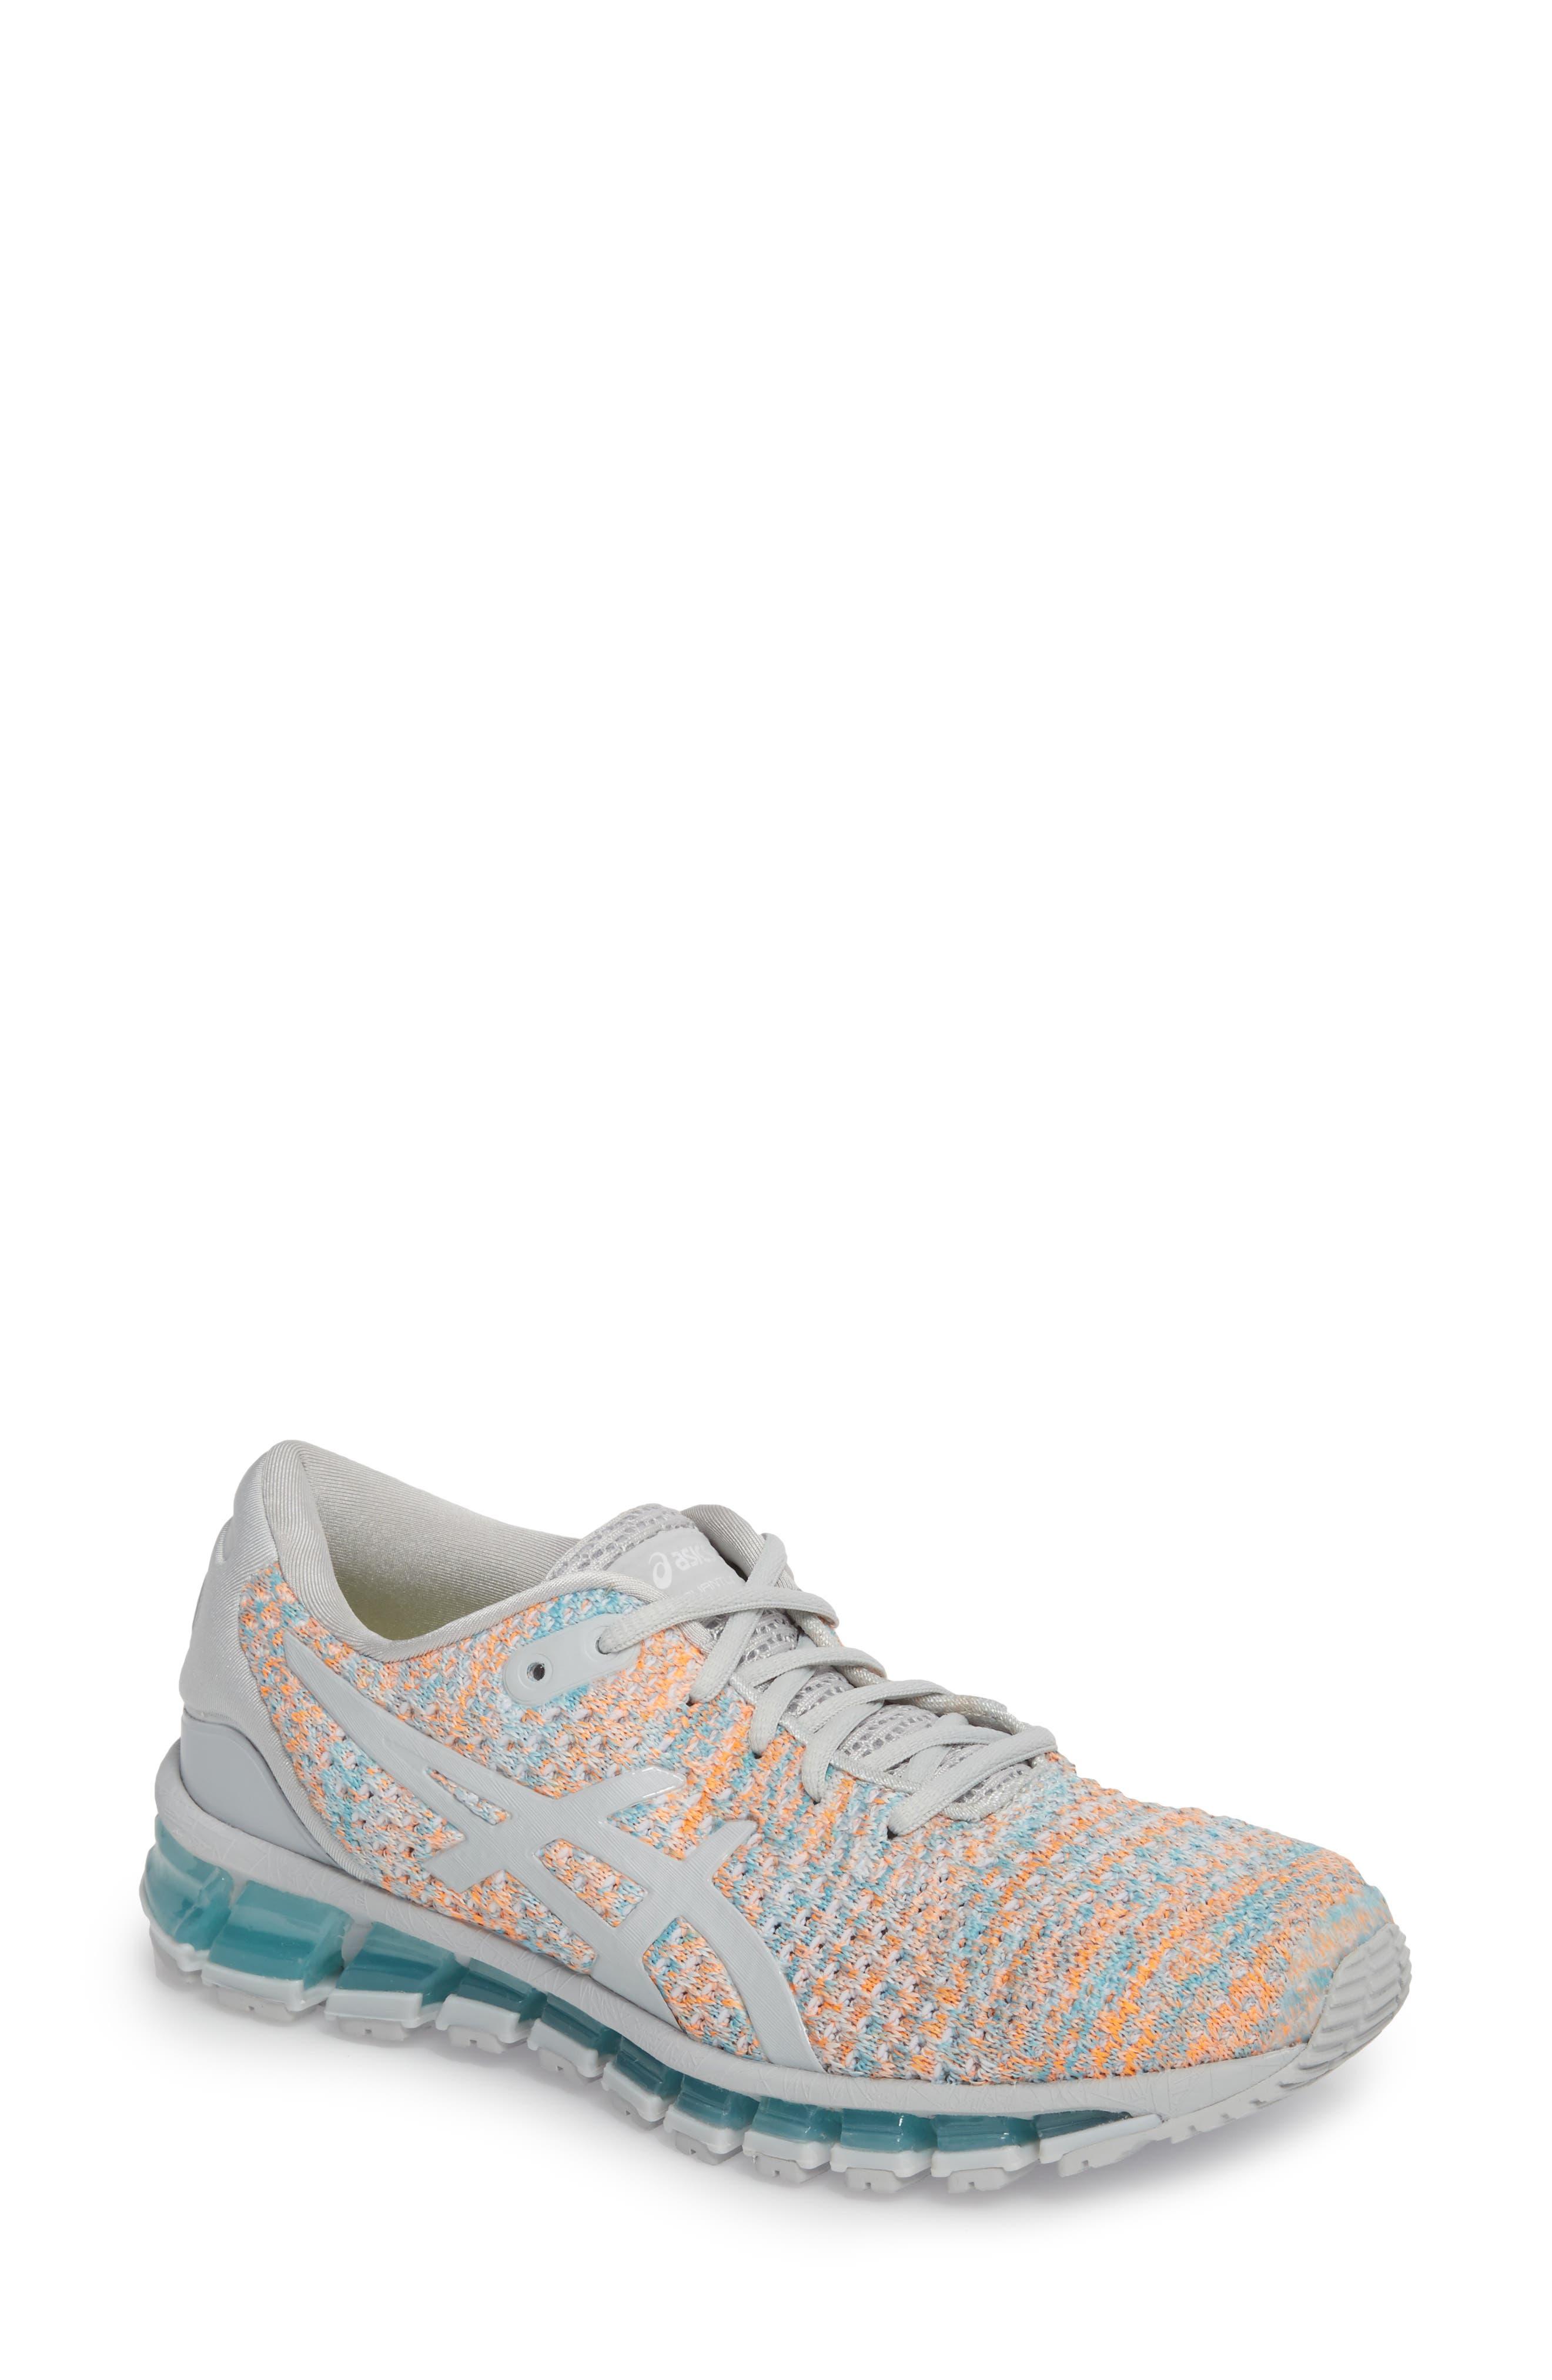 Asics Gel-Quantum 360 Running Shoe B - Grey